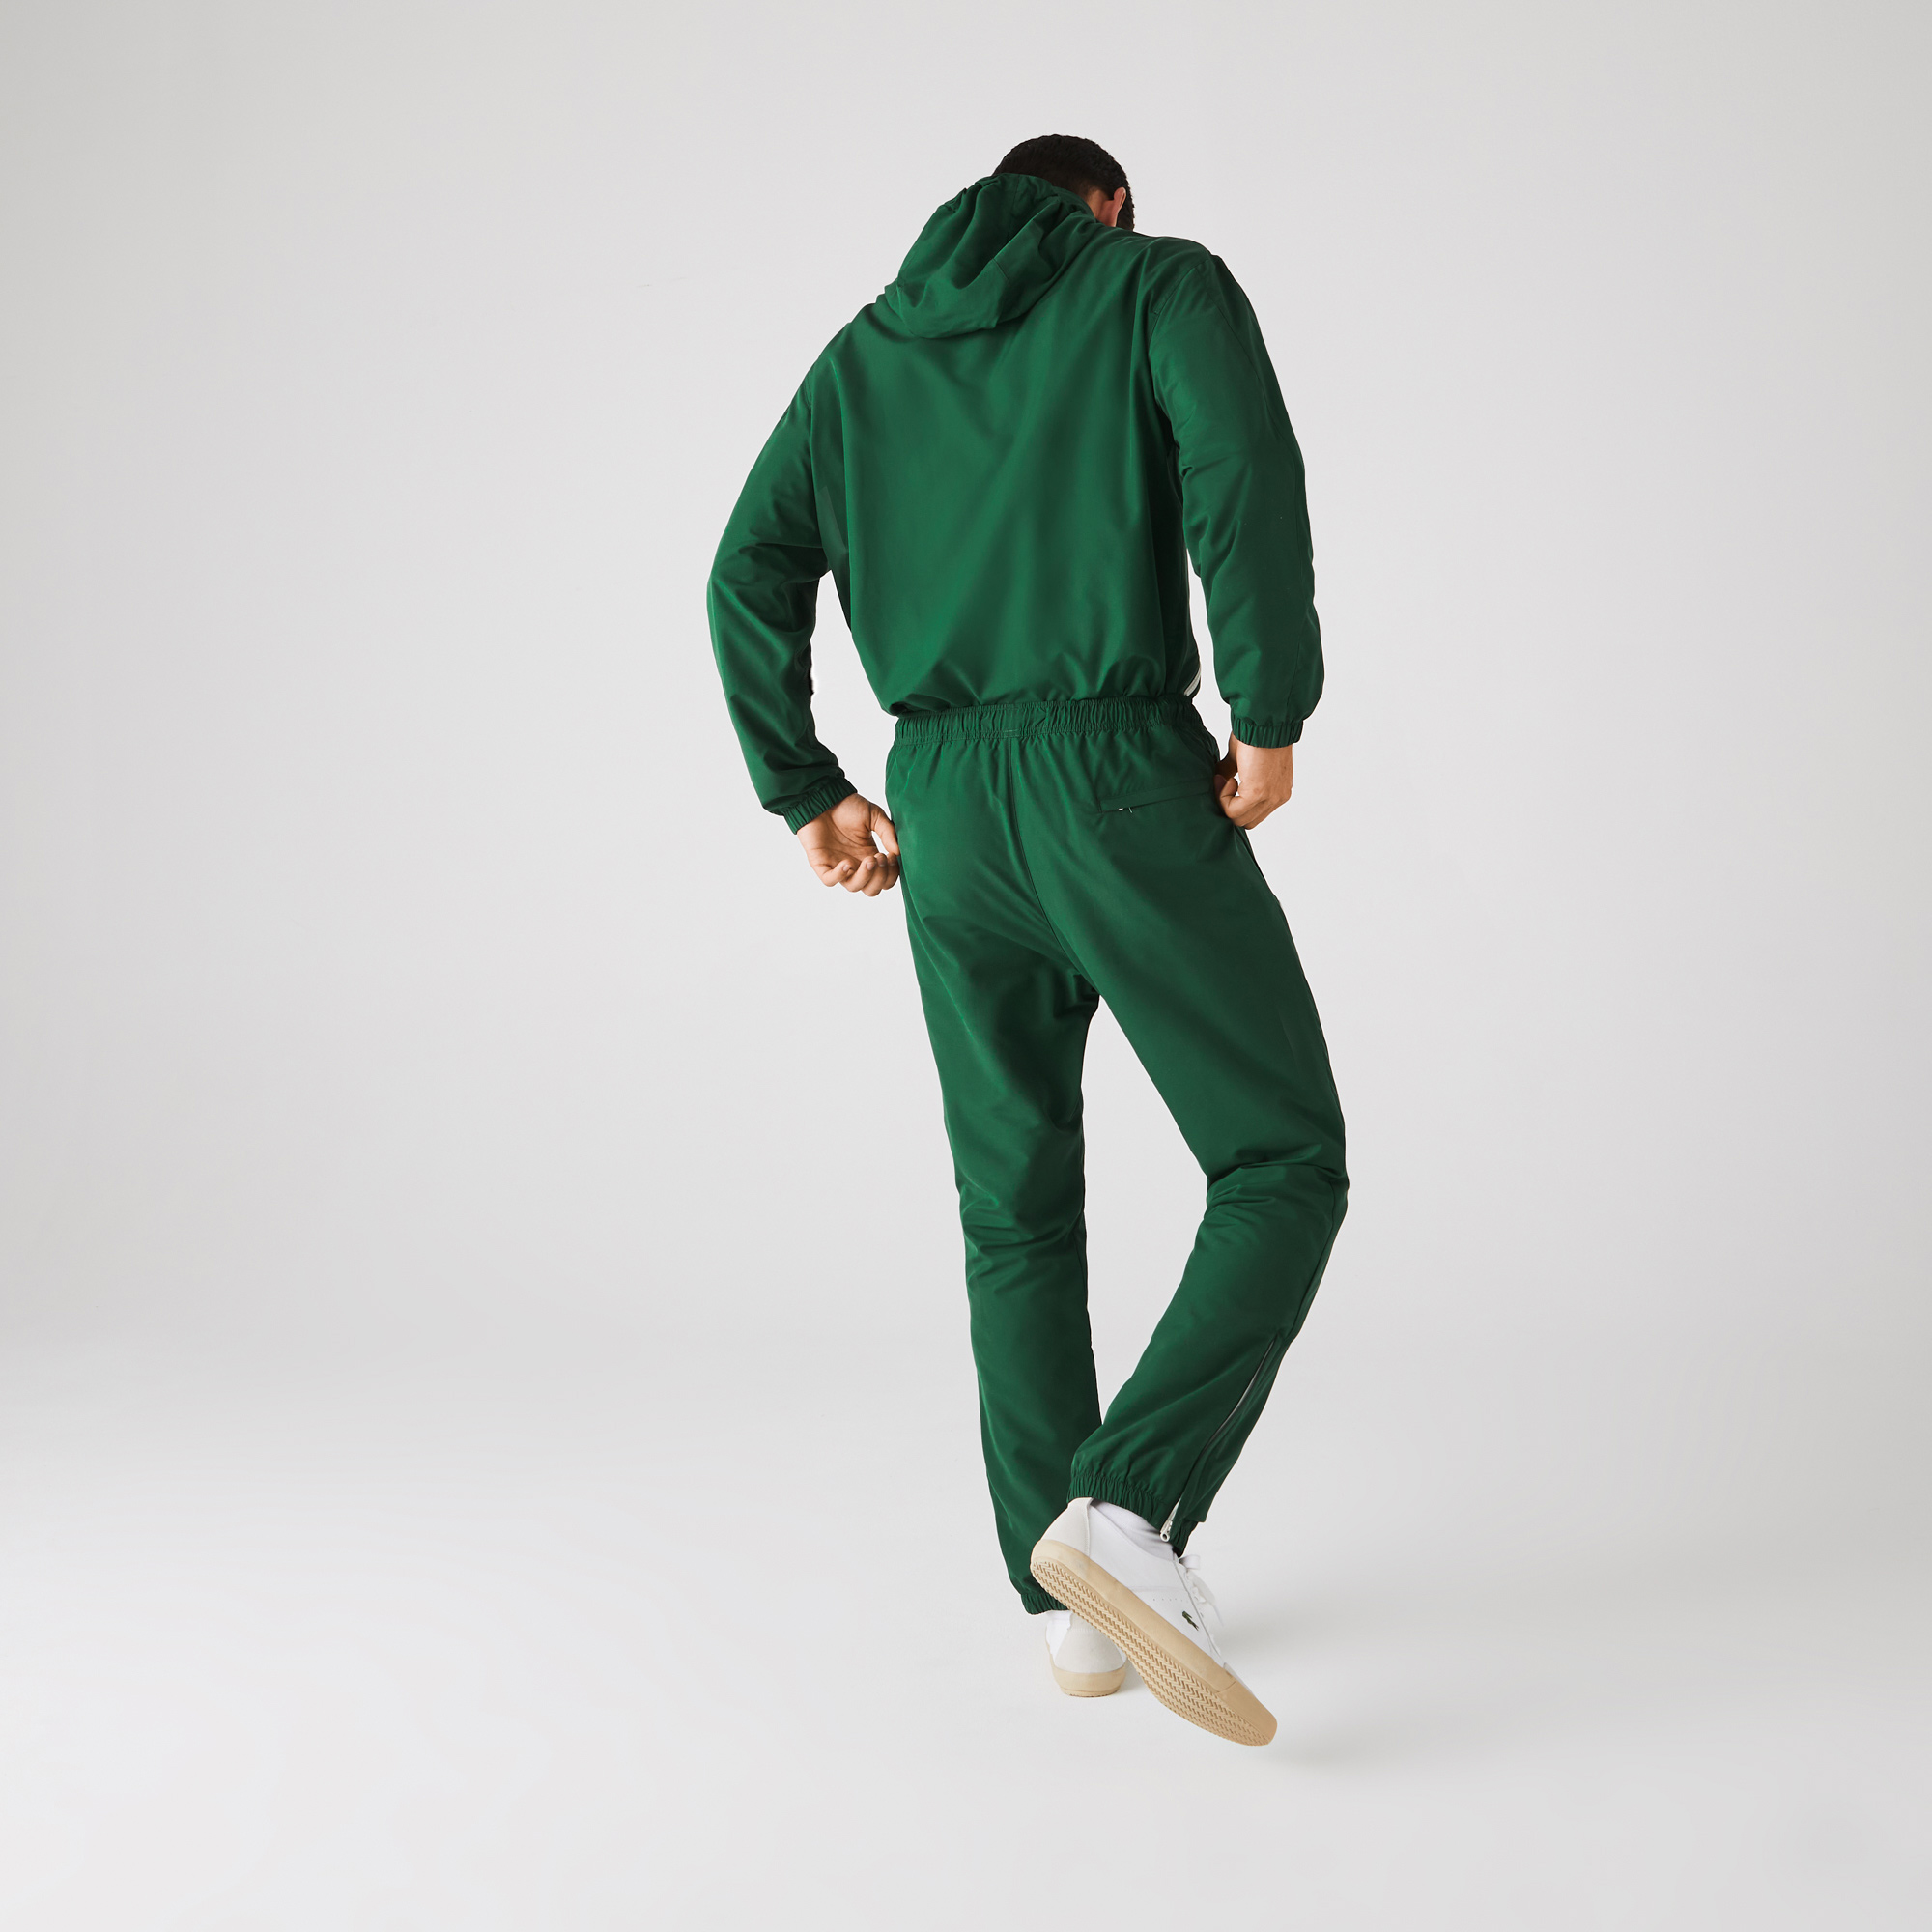 Lacoste Men's Lightweight Tracksuit Pants